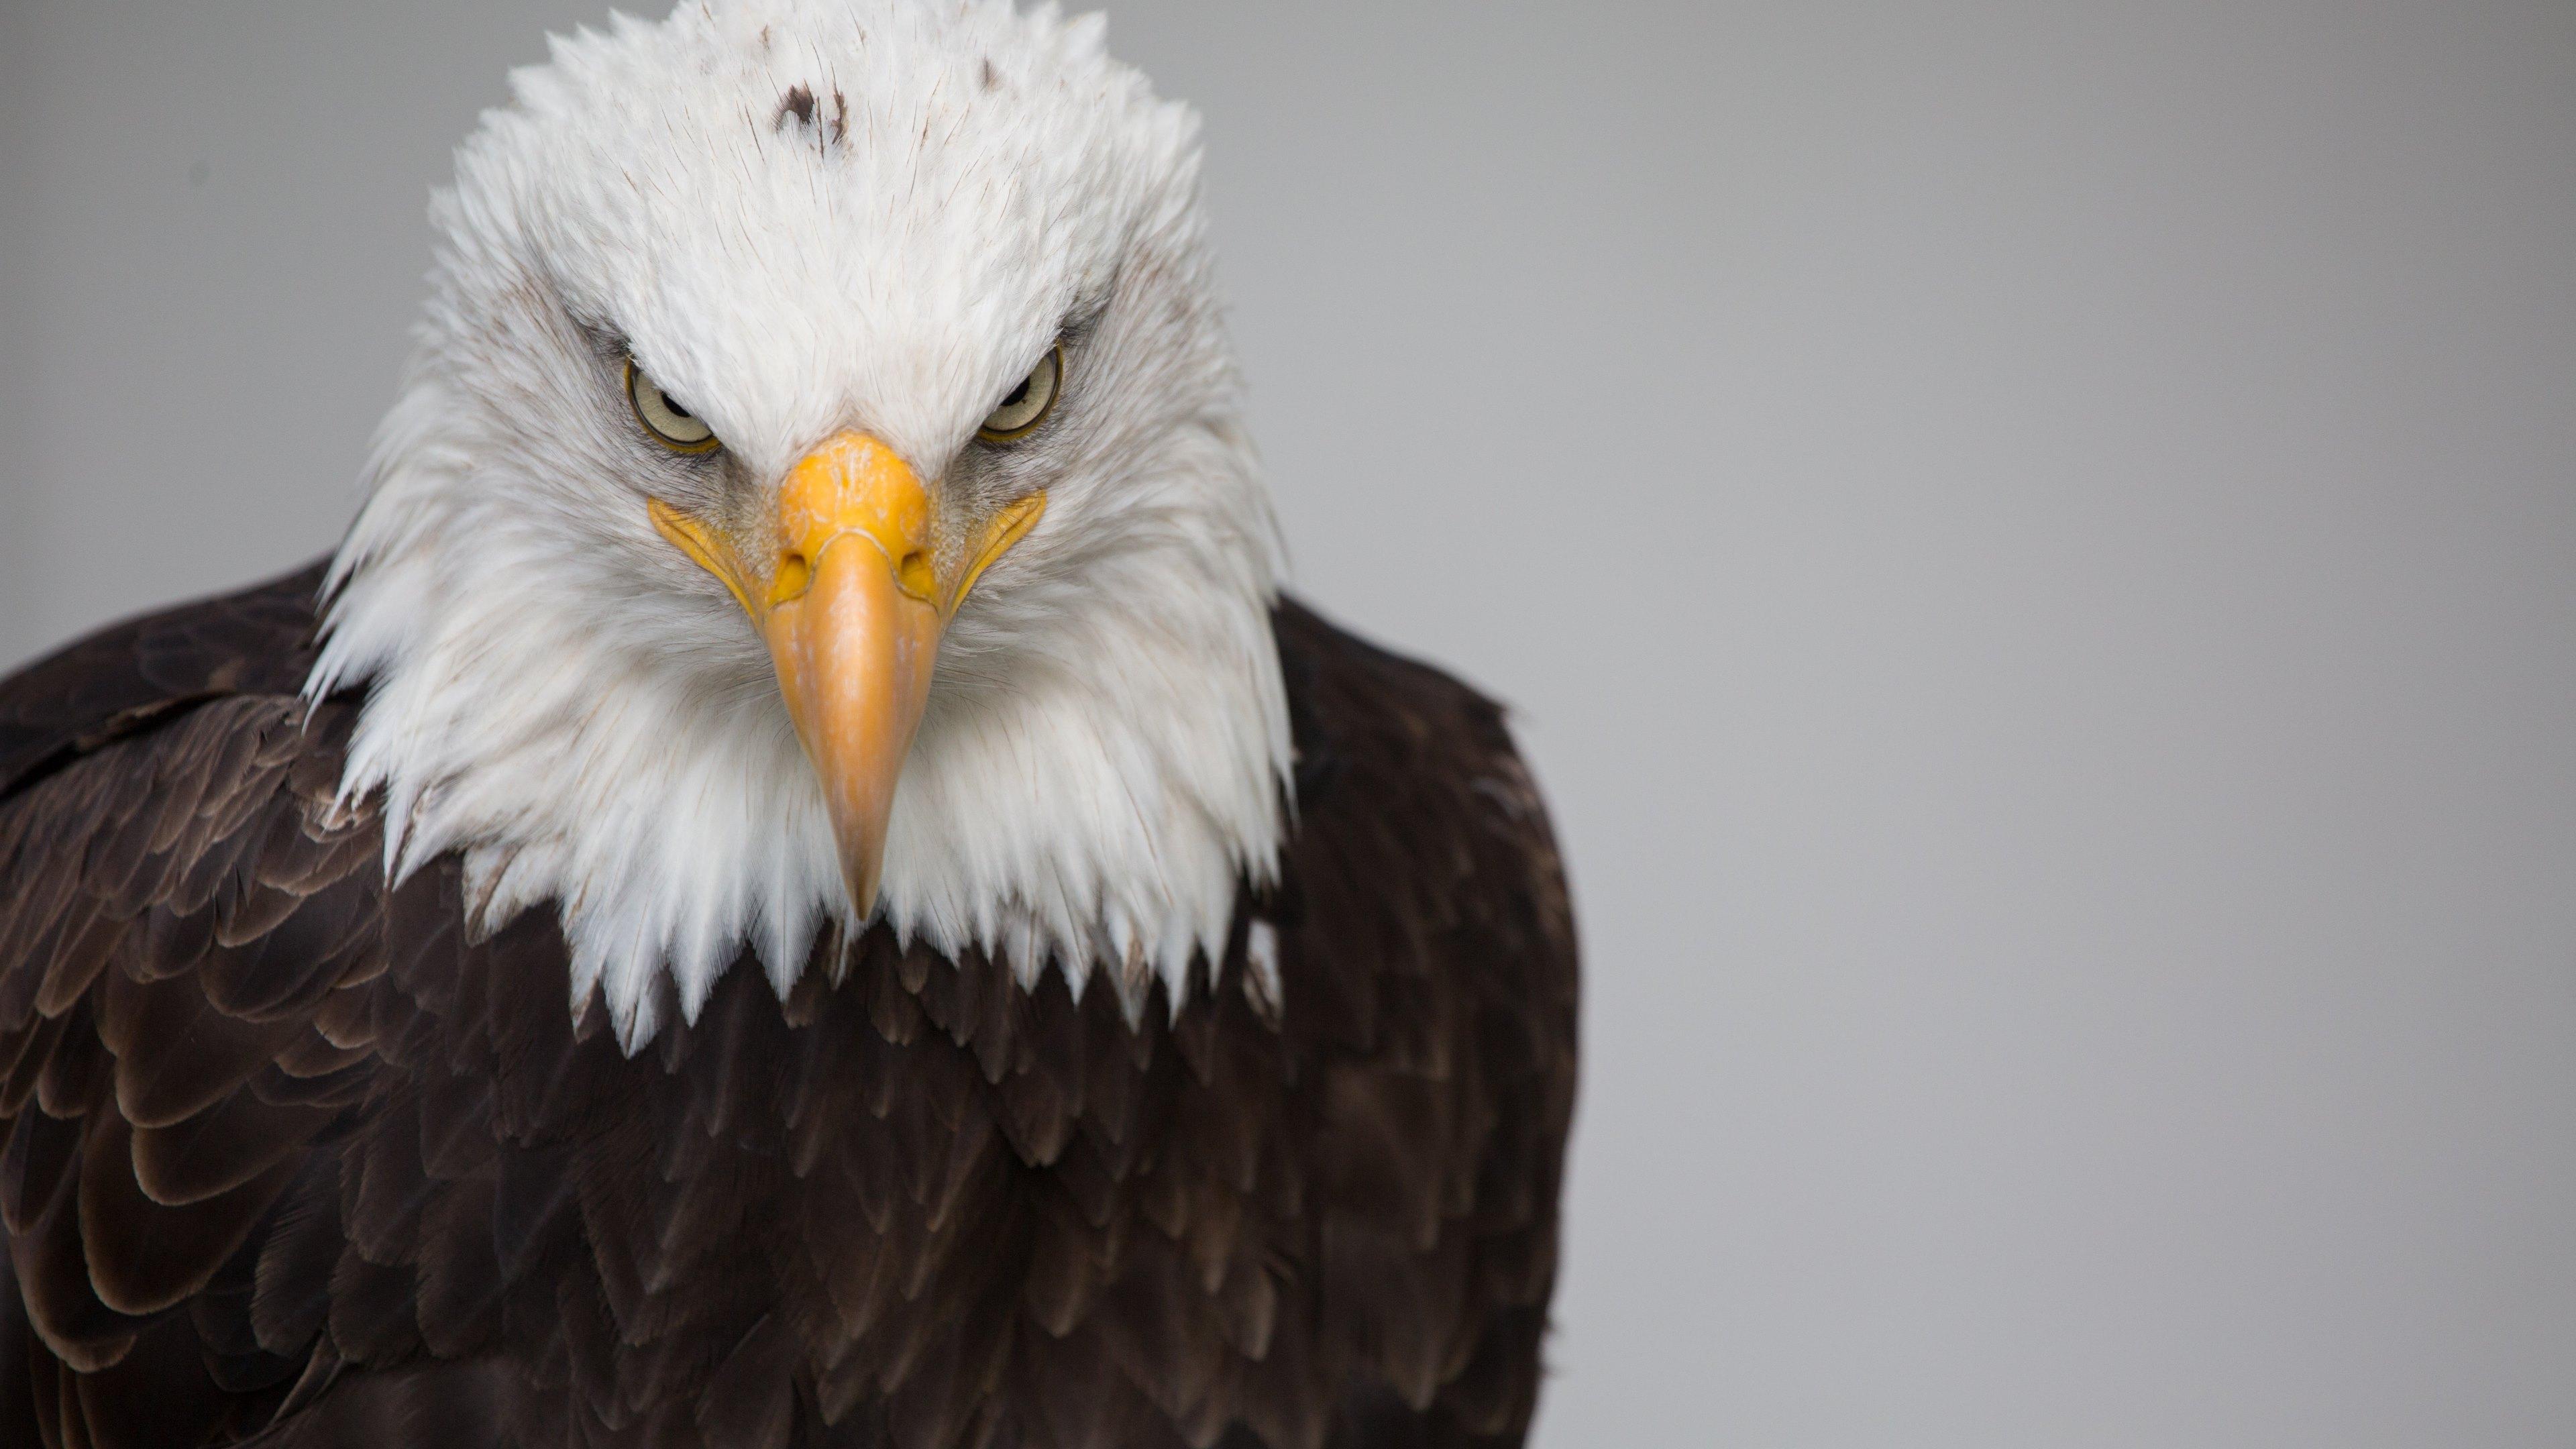 Hd wallpaper eagle - Hd Wallpaper Background Id 789283 3840x2160 Animal Bald Eagle